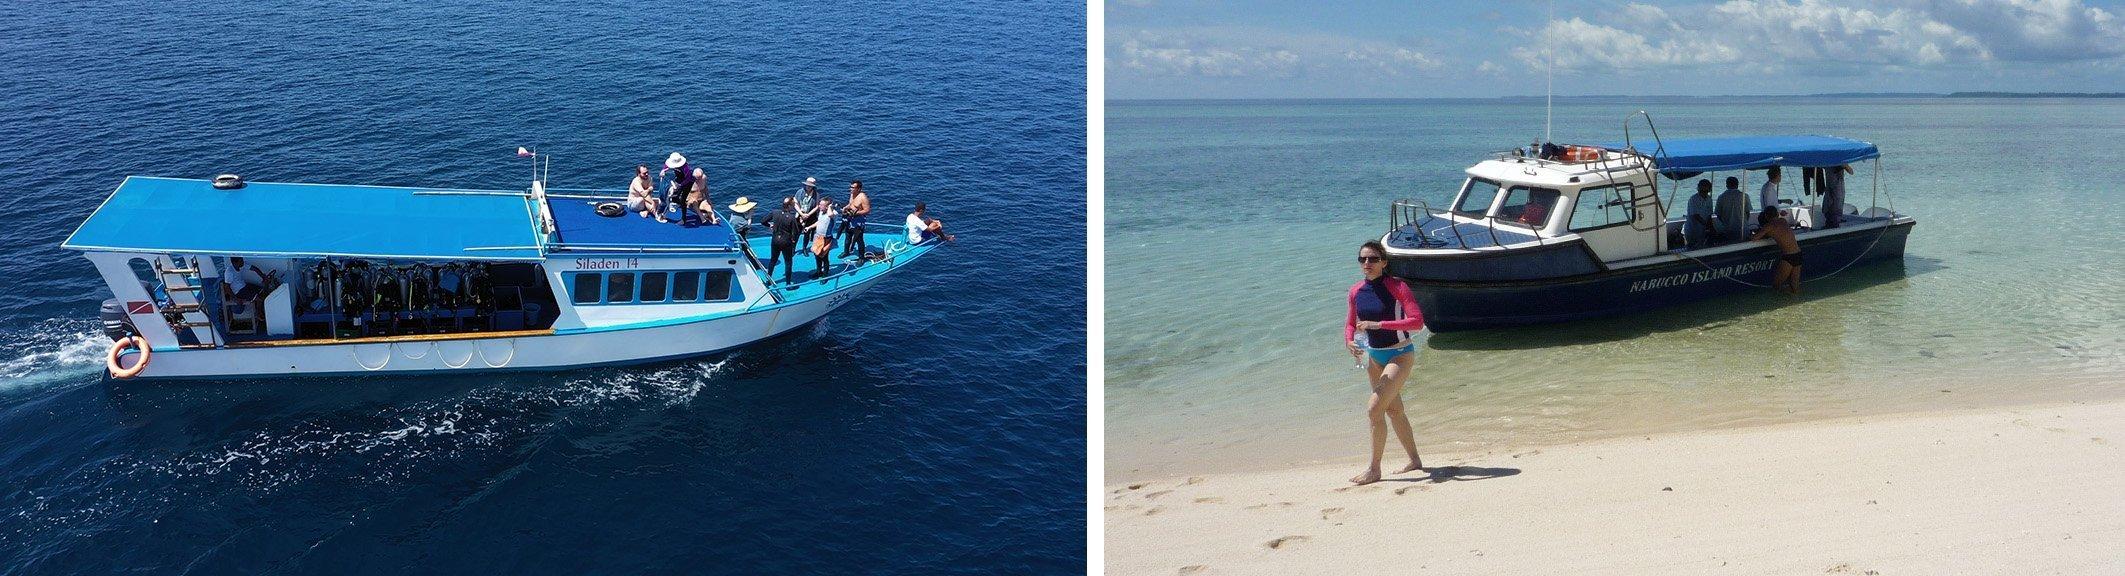 Snorkeling Boats for Siladen Resort and Nunukan Island Resort